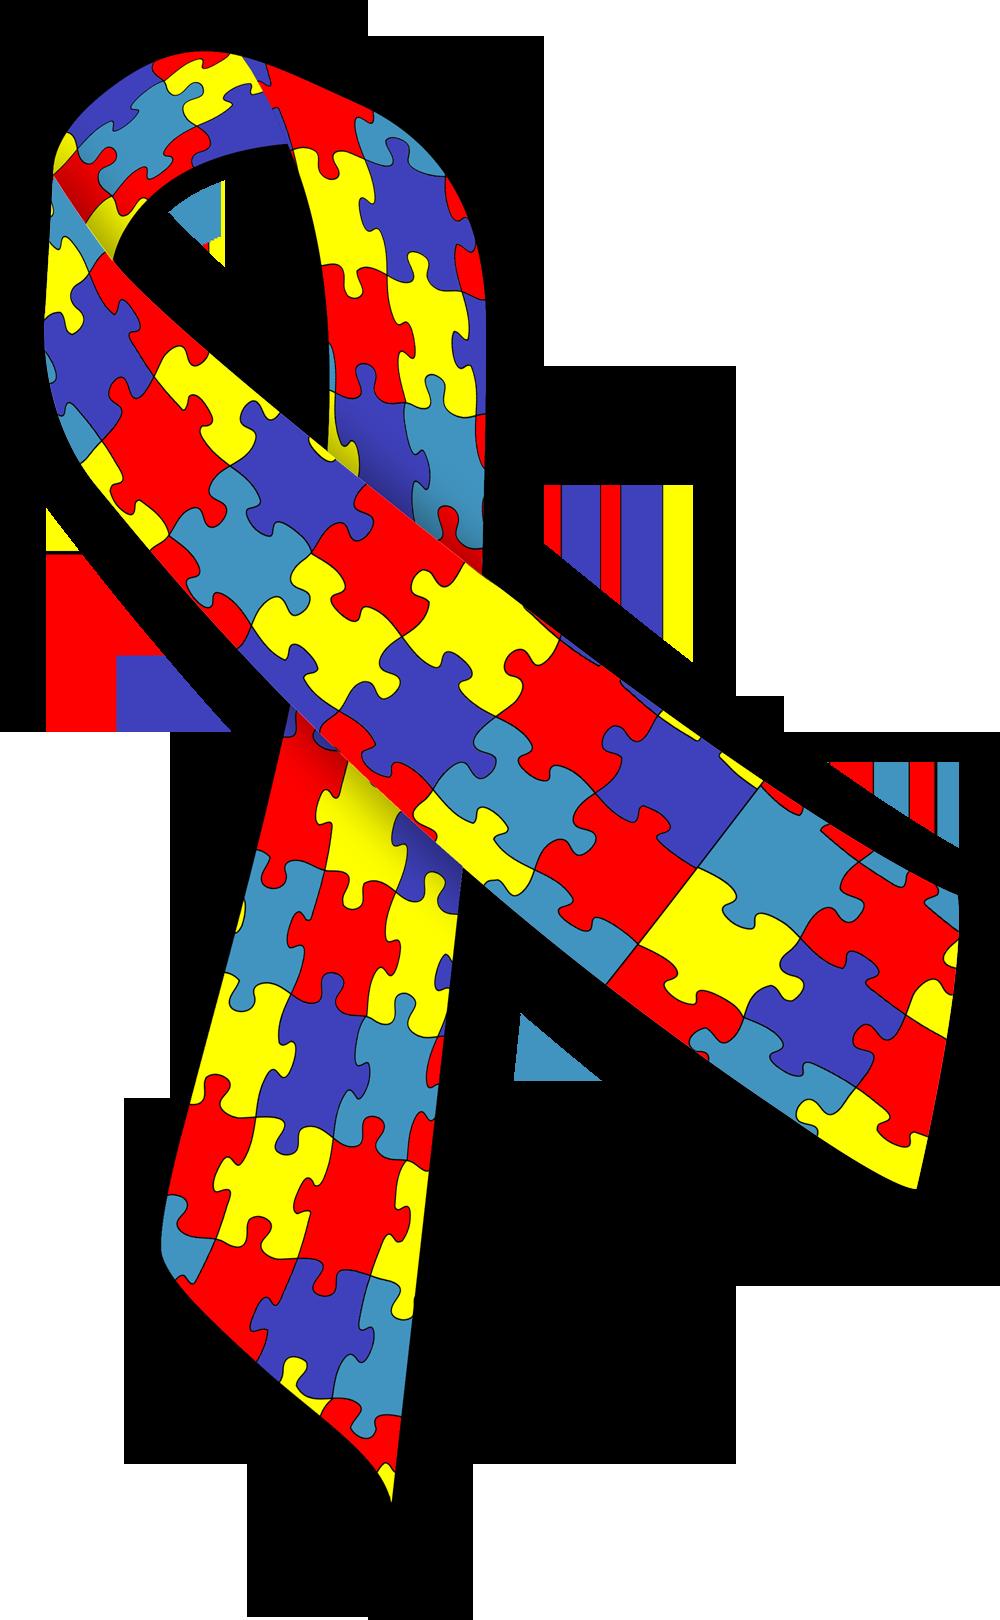 Ruban de l'autisme